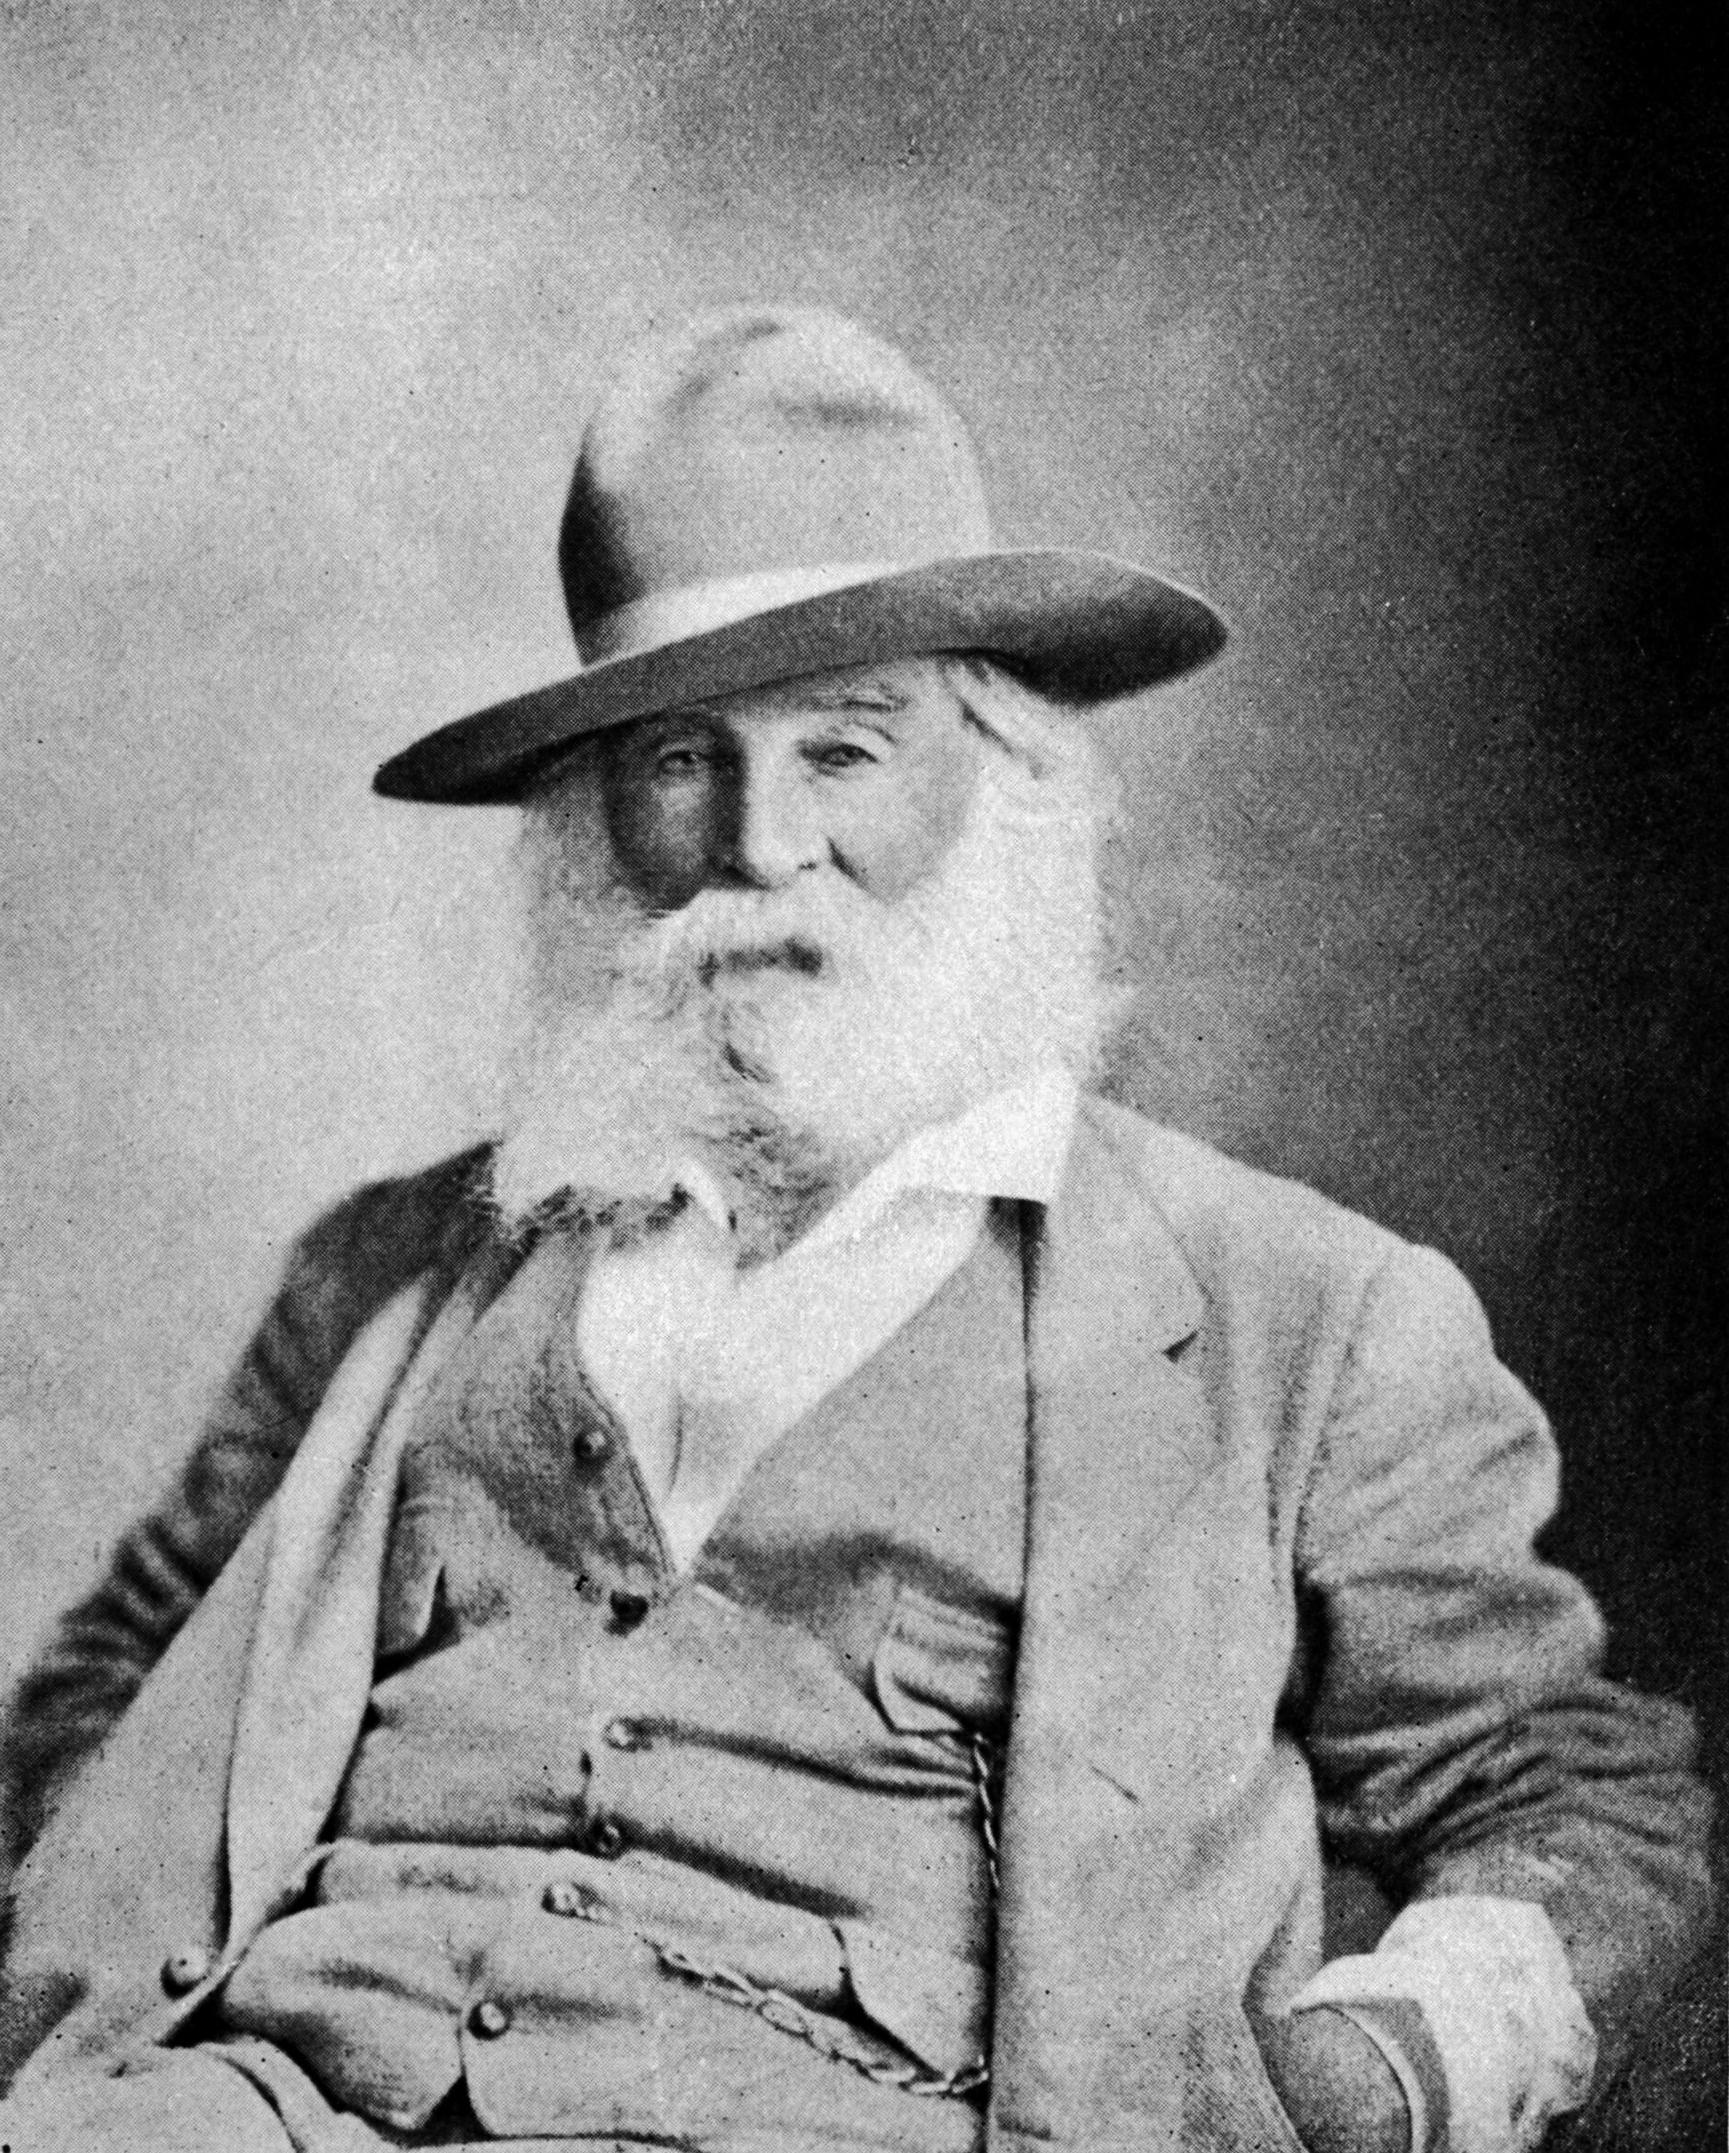 Walt_Whitman_at_65.jpg